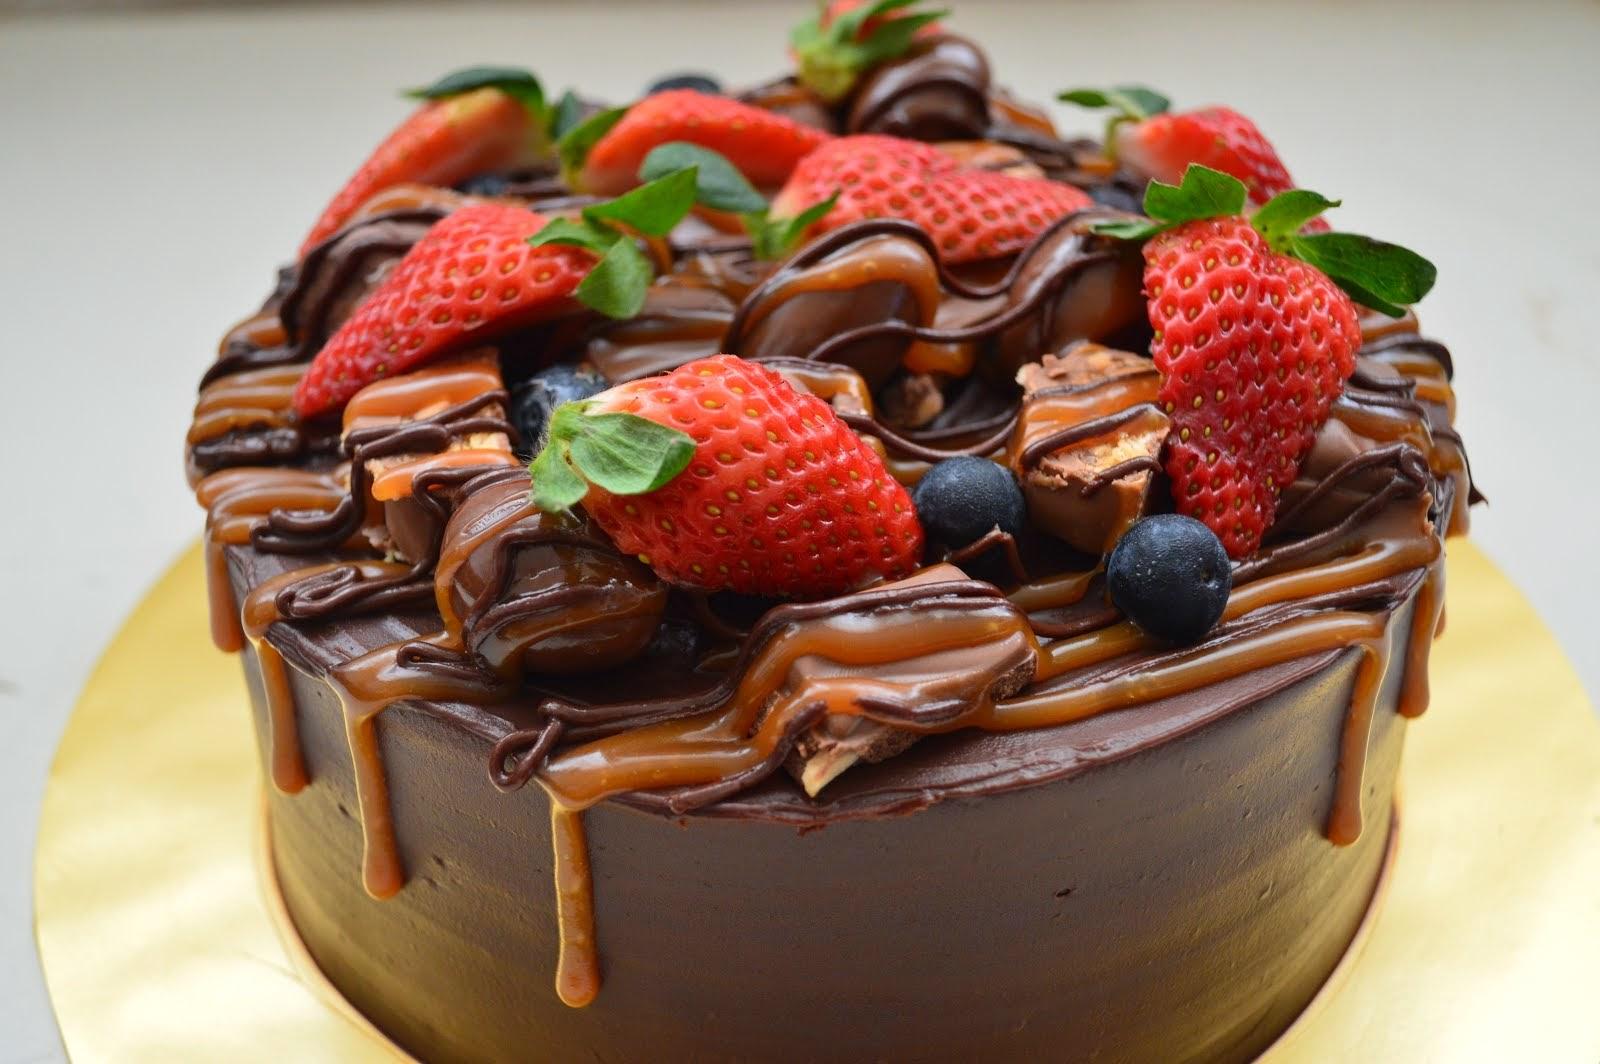 BELGIAN CHOC CAKE